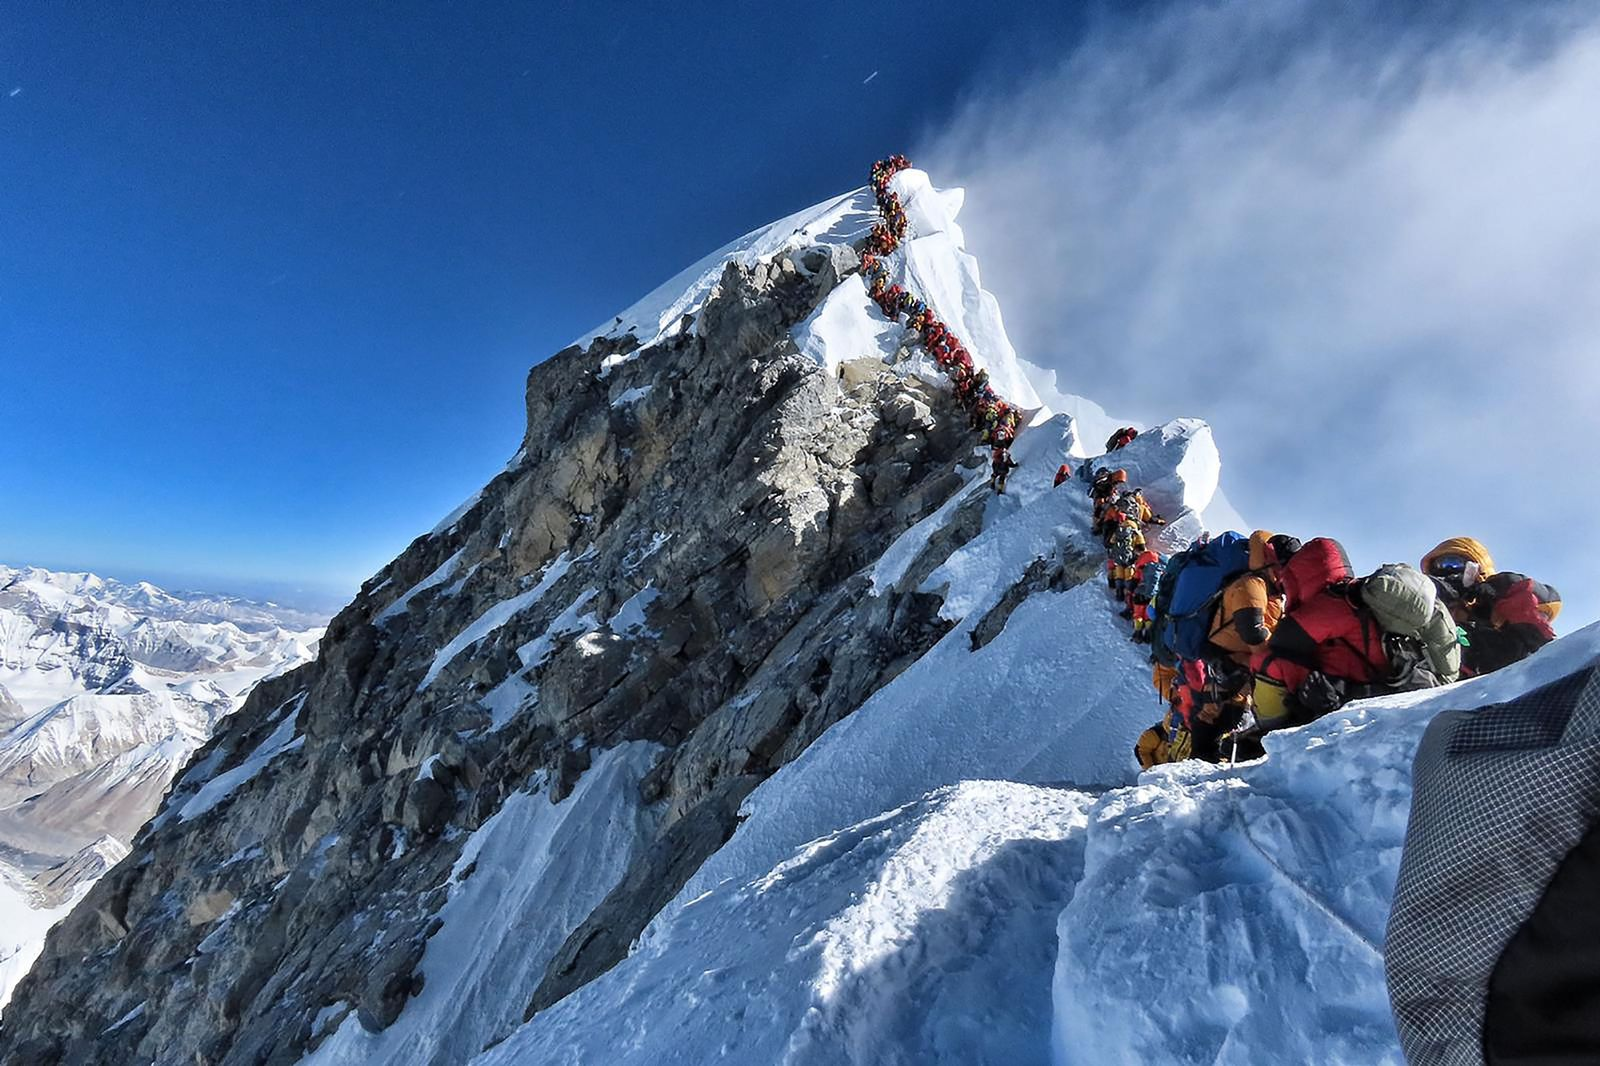 TOPSHOT-NEPAL-MOUNTAINEERING-EVEREST